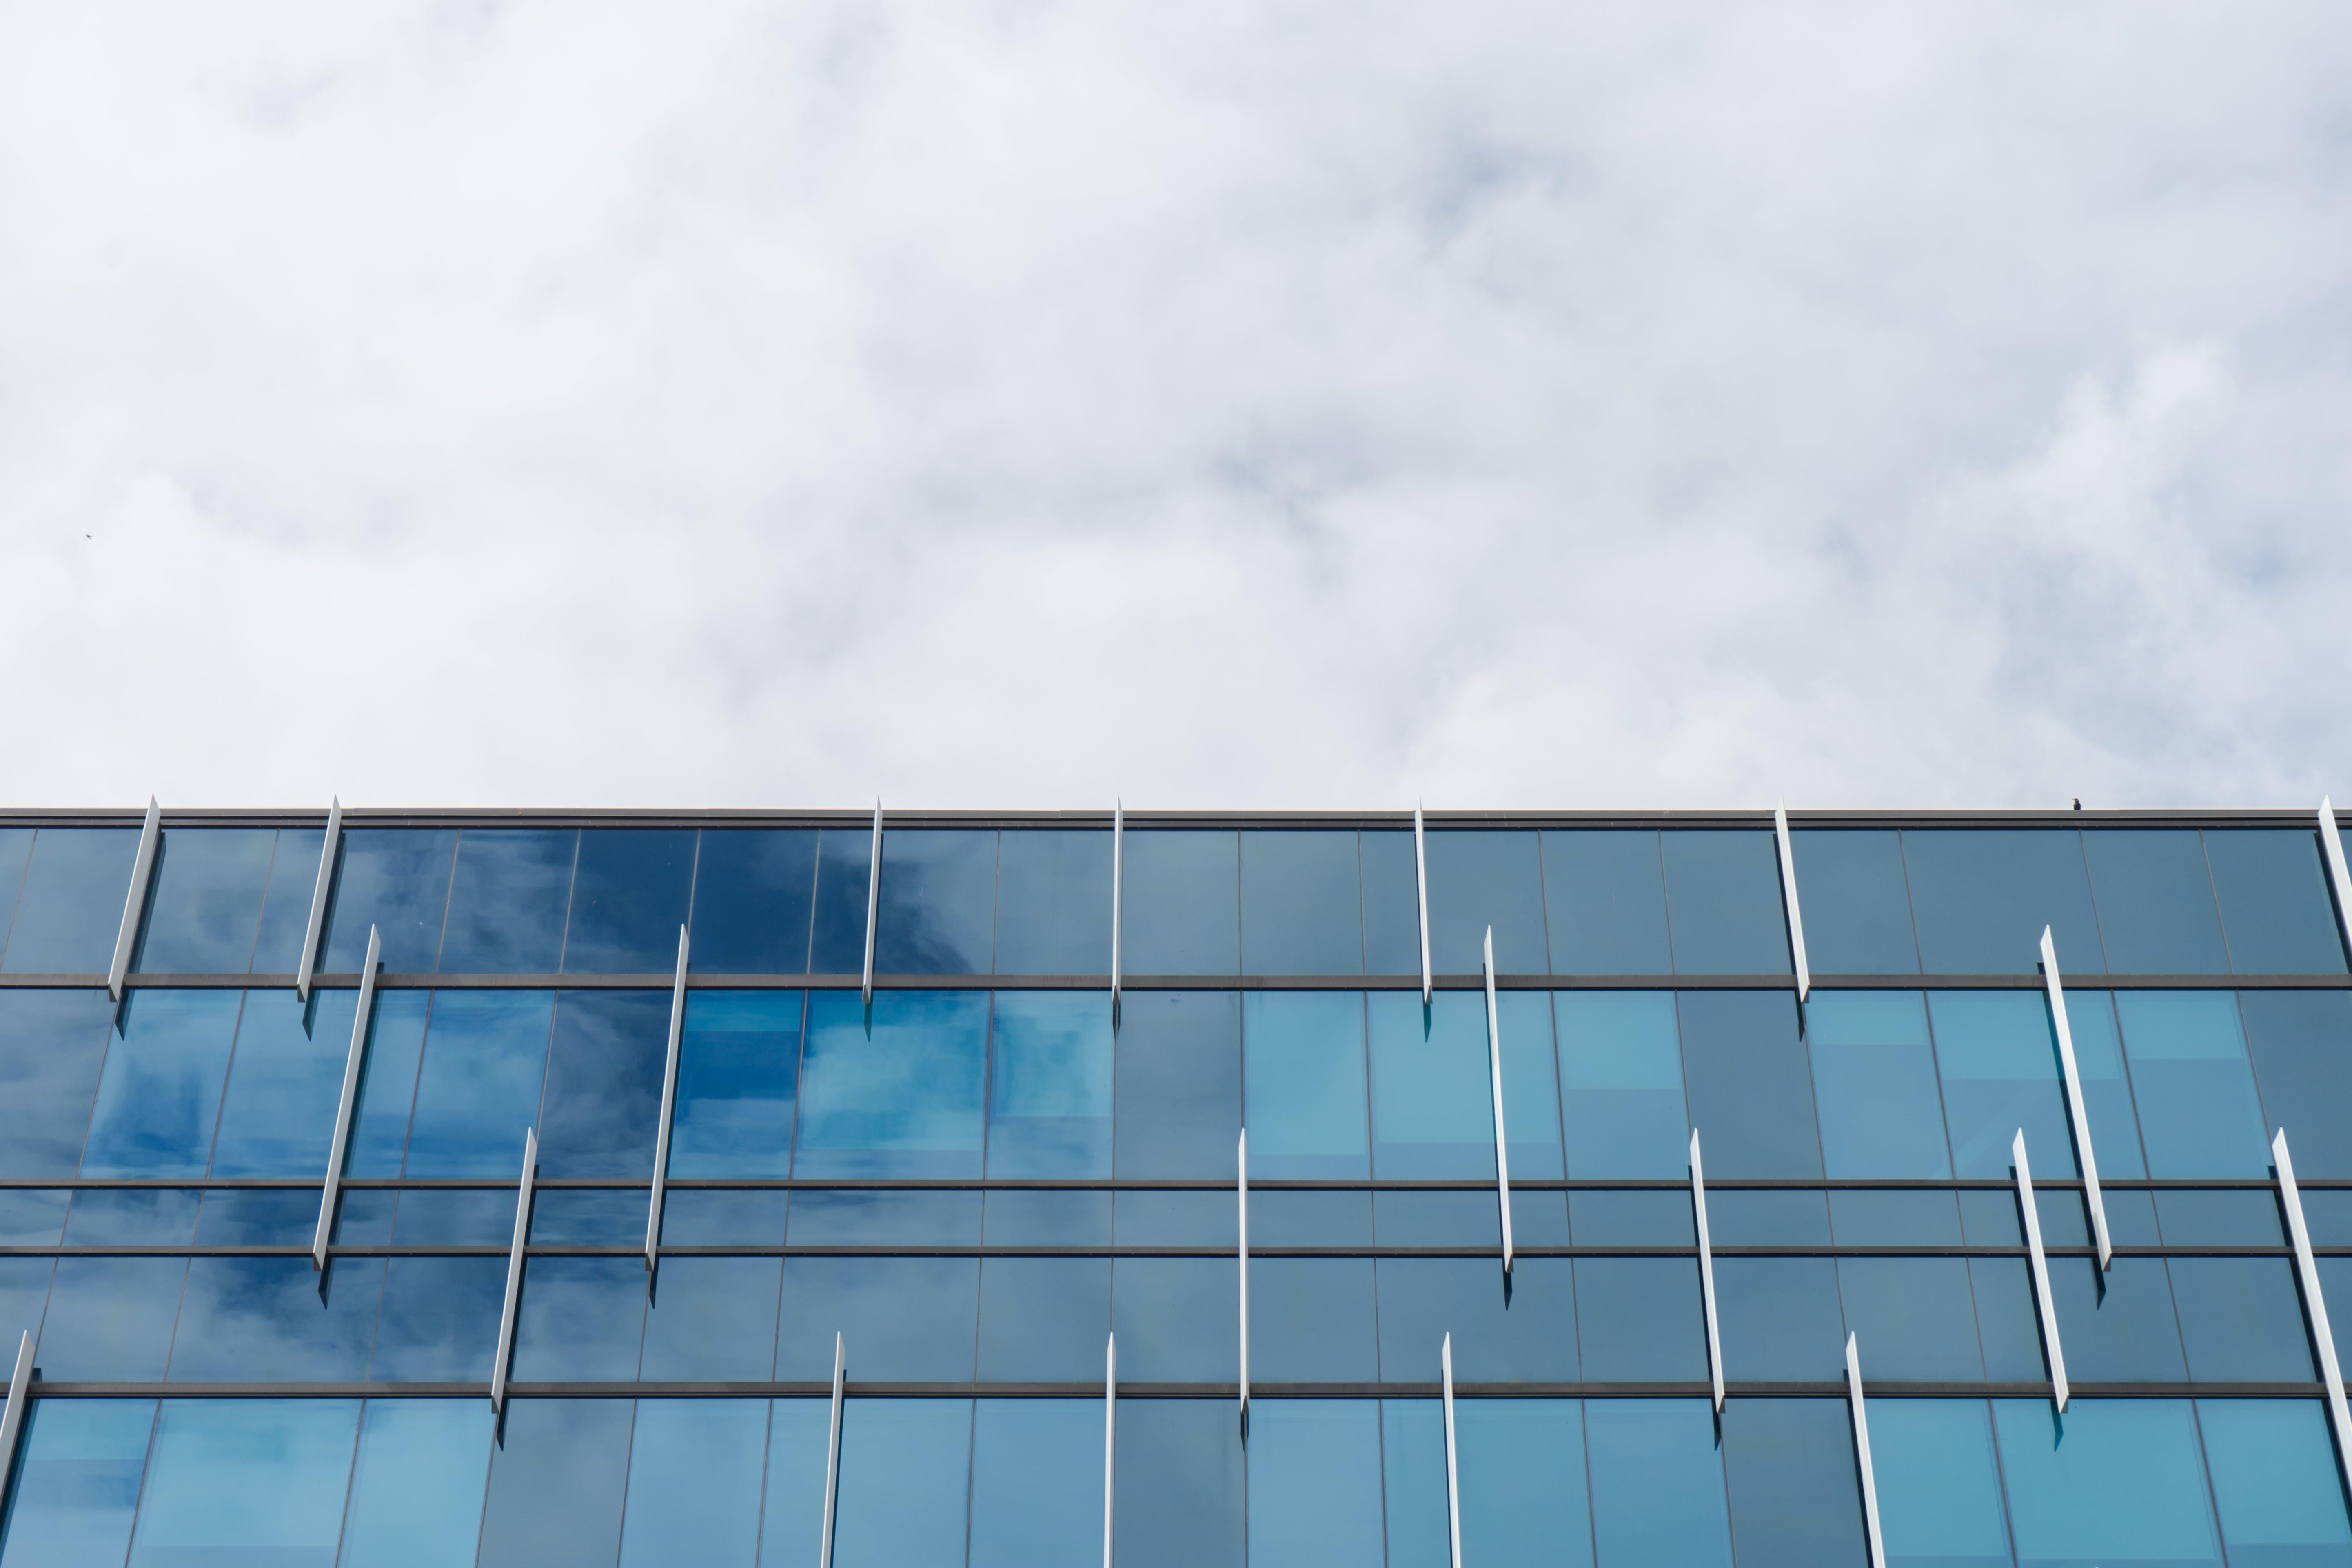 architecture, building, building exterior